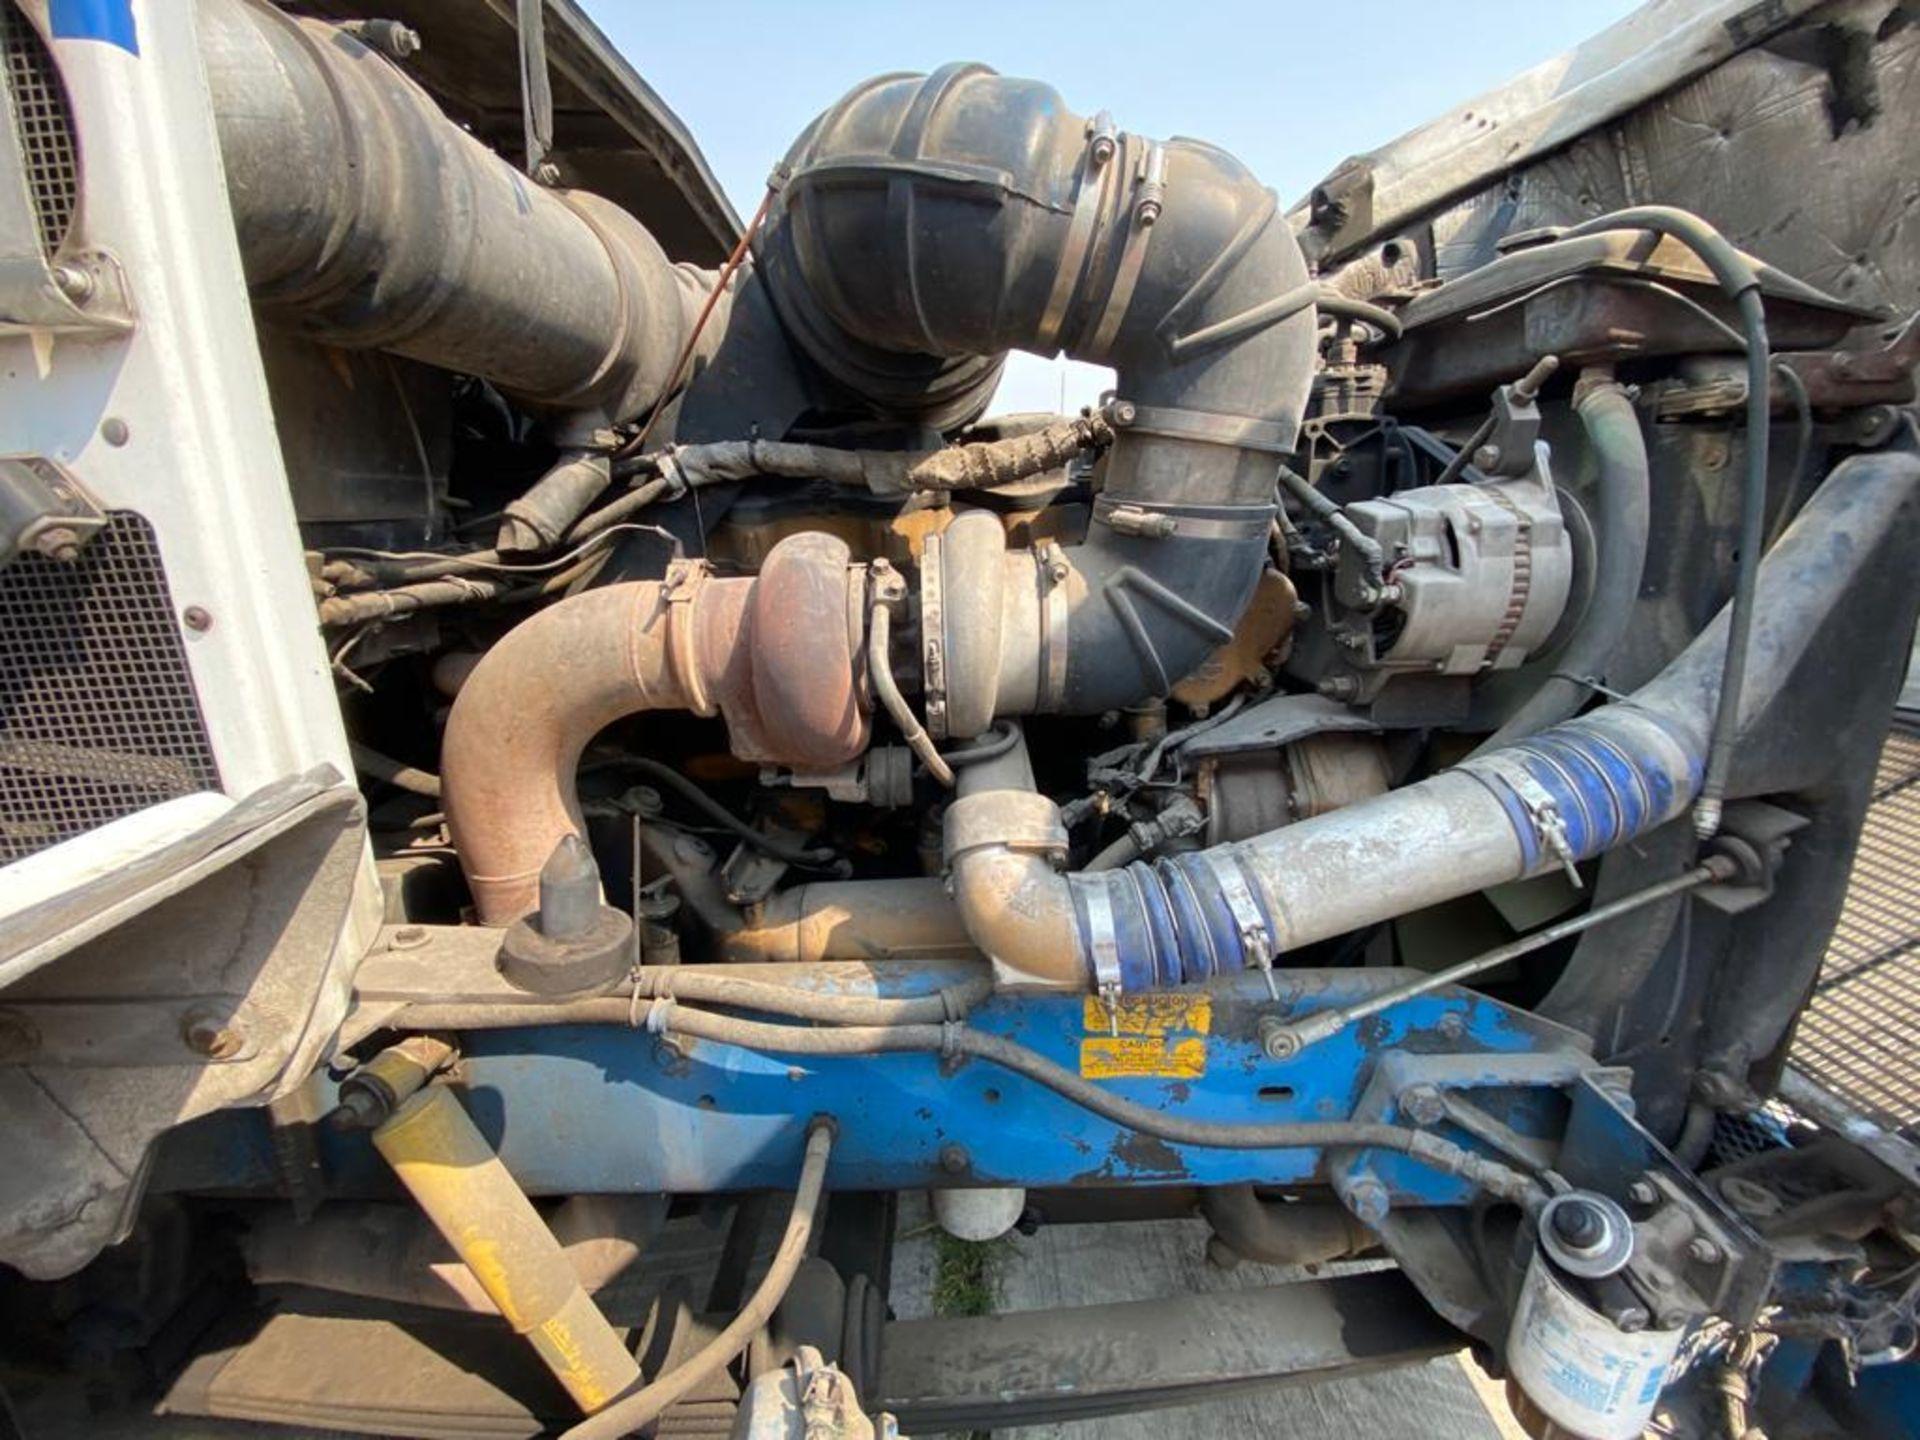 1999 Kenworth Sleeper truck tractor, standard transmission of 18 speeds - Image 63 of 72